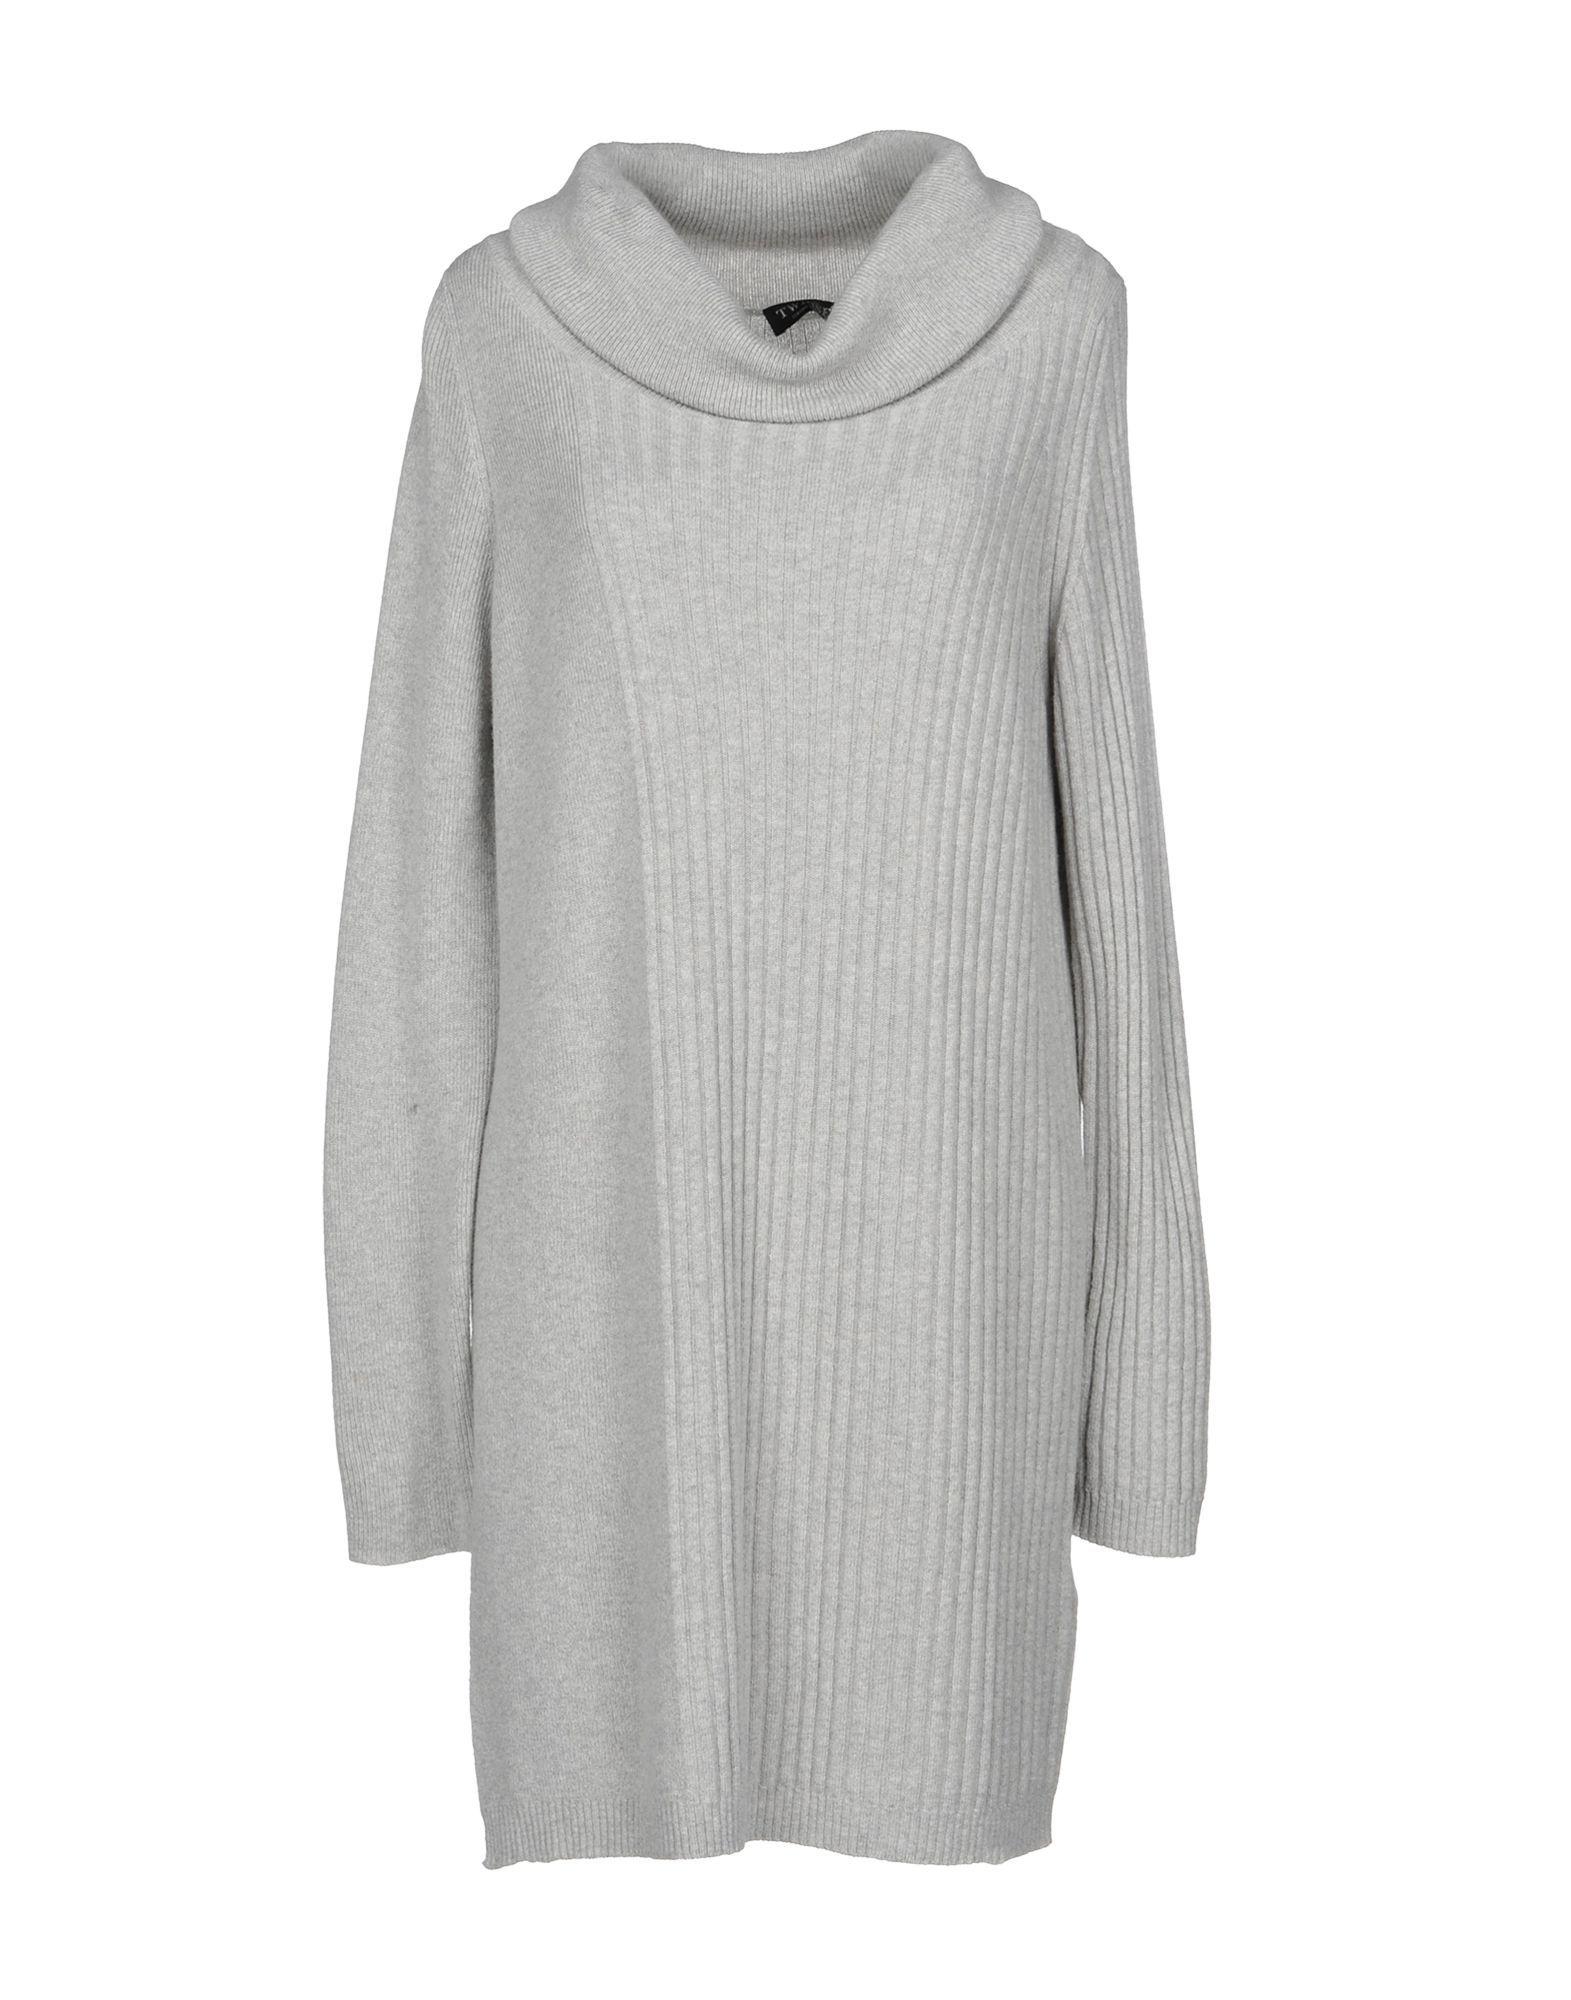 Twinset Light Grey Wool Jumper